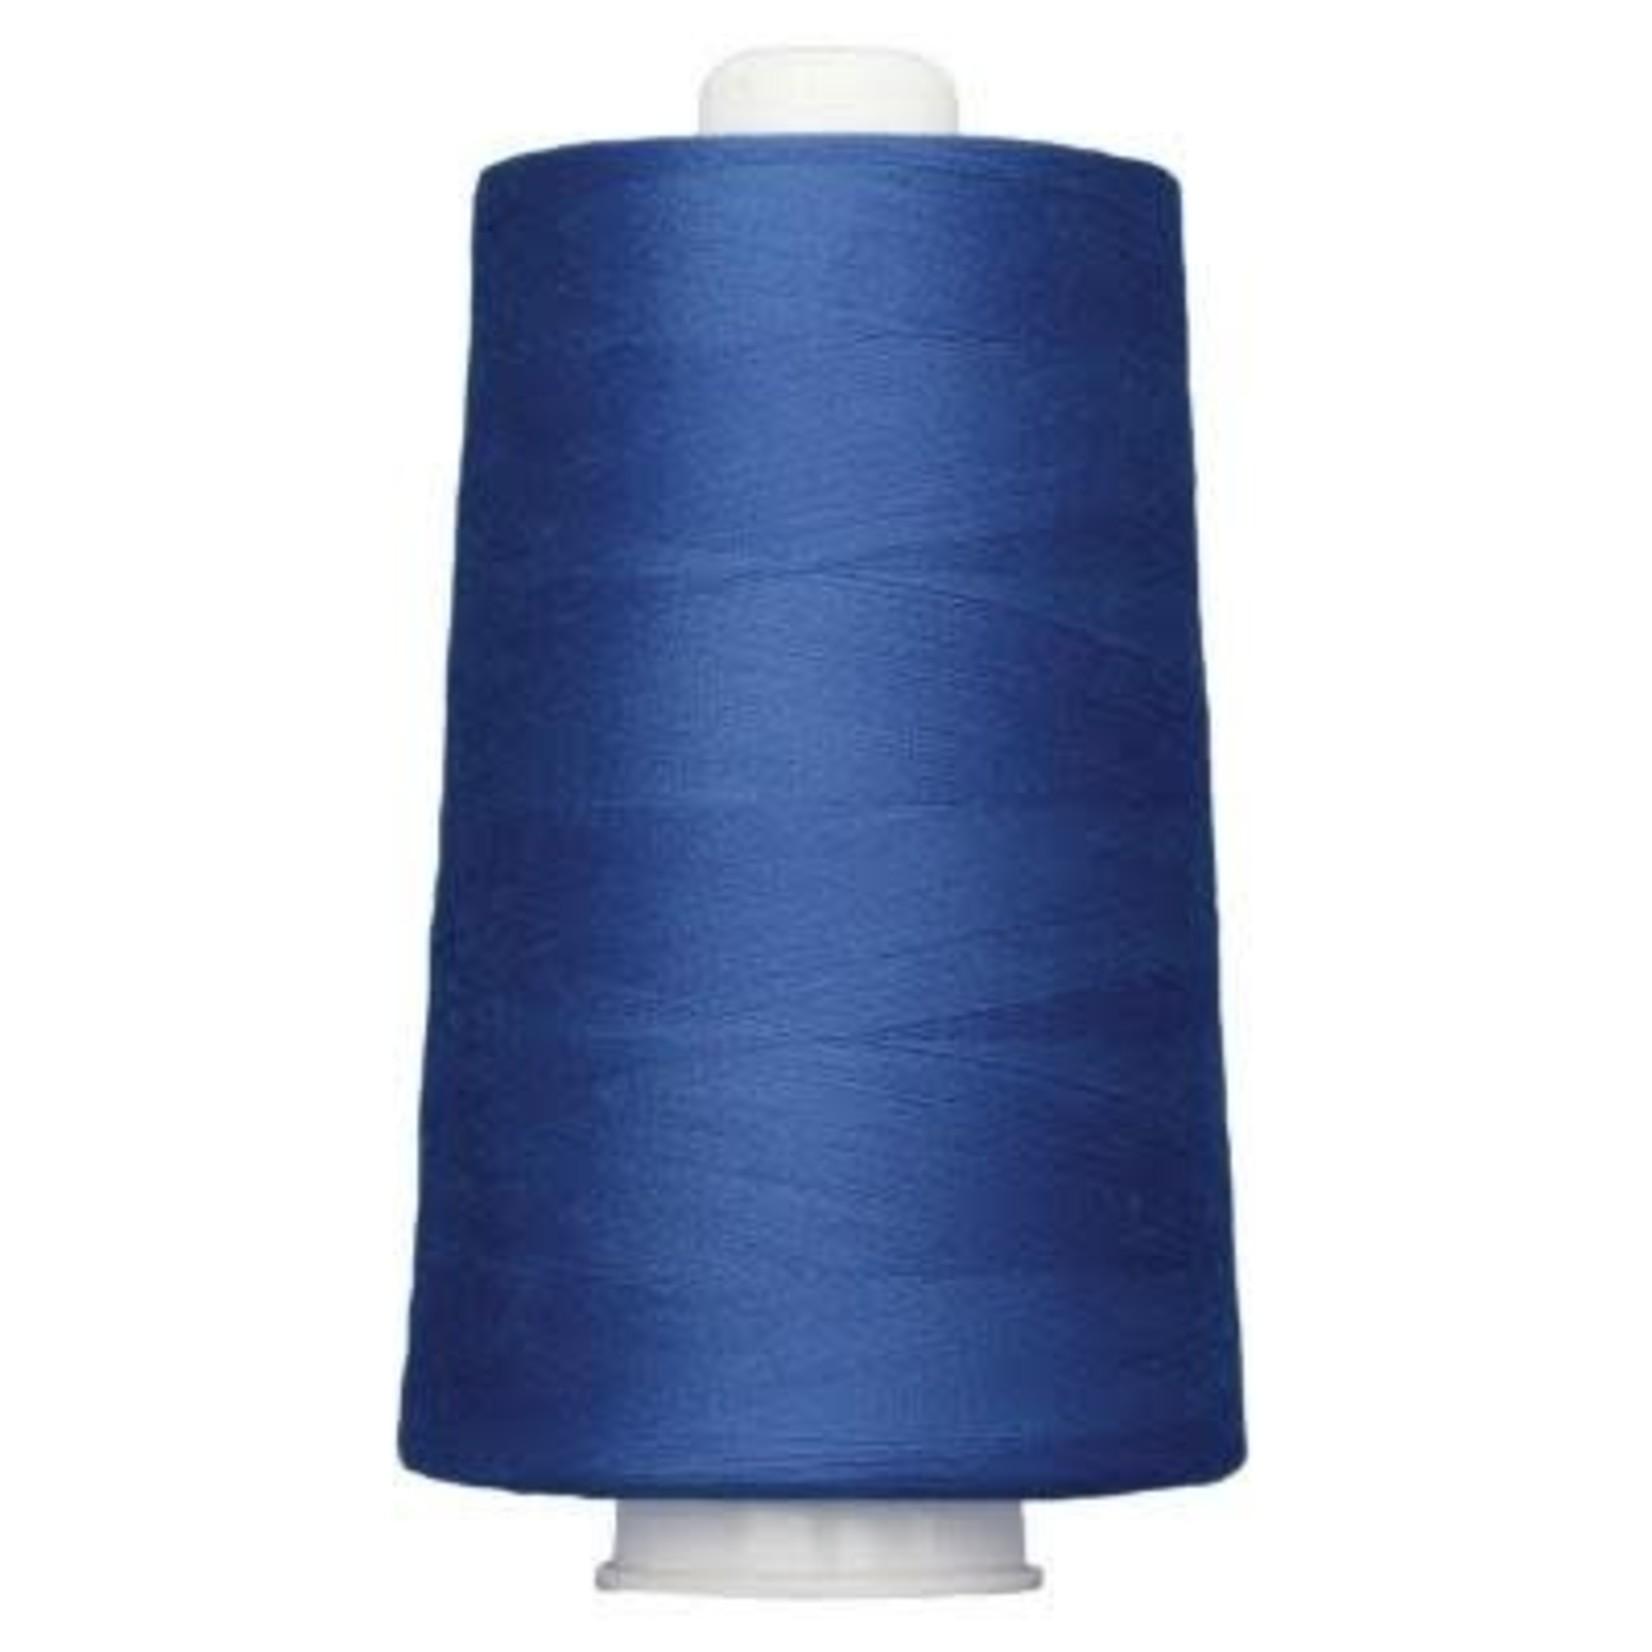 Superior Threads Omni 3170 Bright Periwinkle 6000 Yards